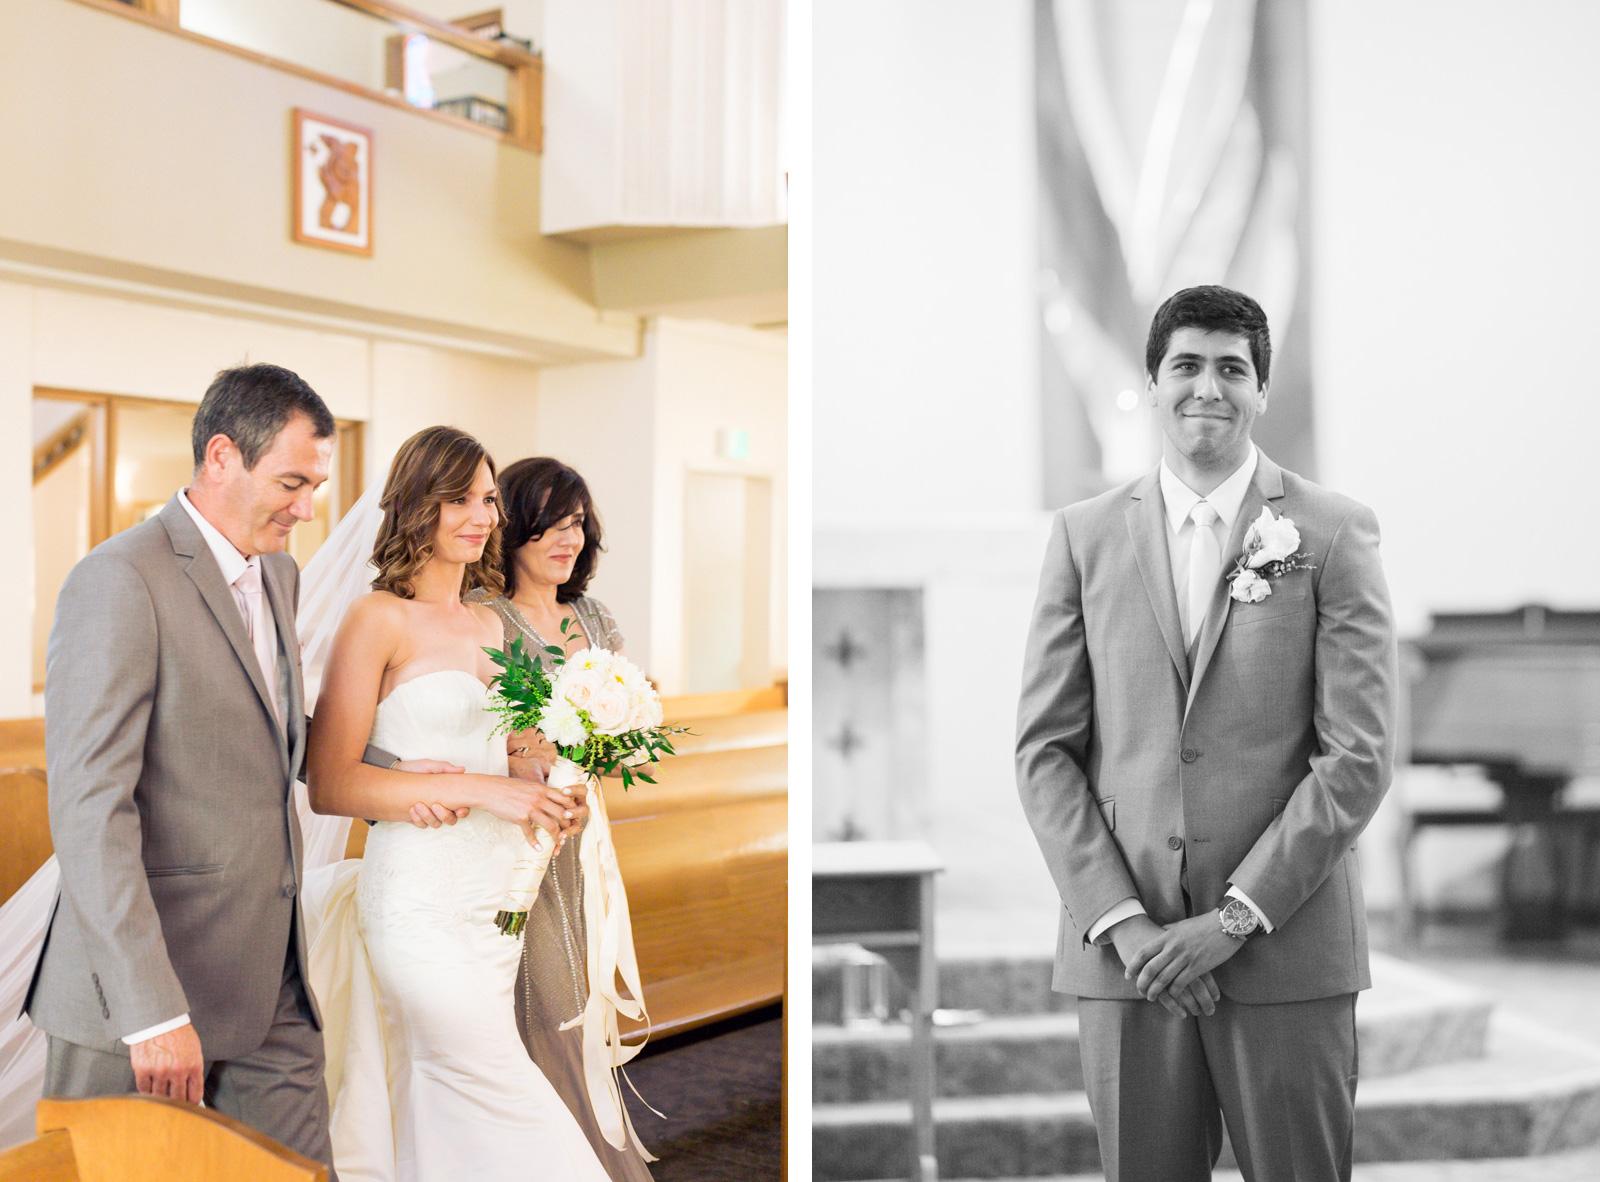 Wedding-Ceremony_01.jpg